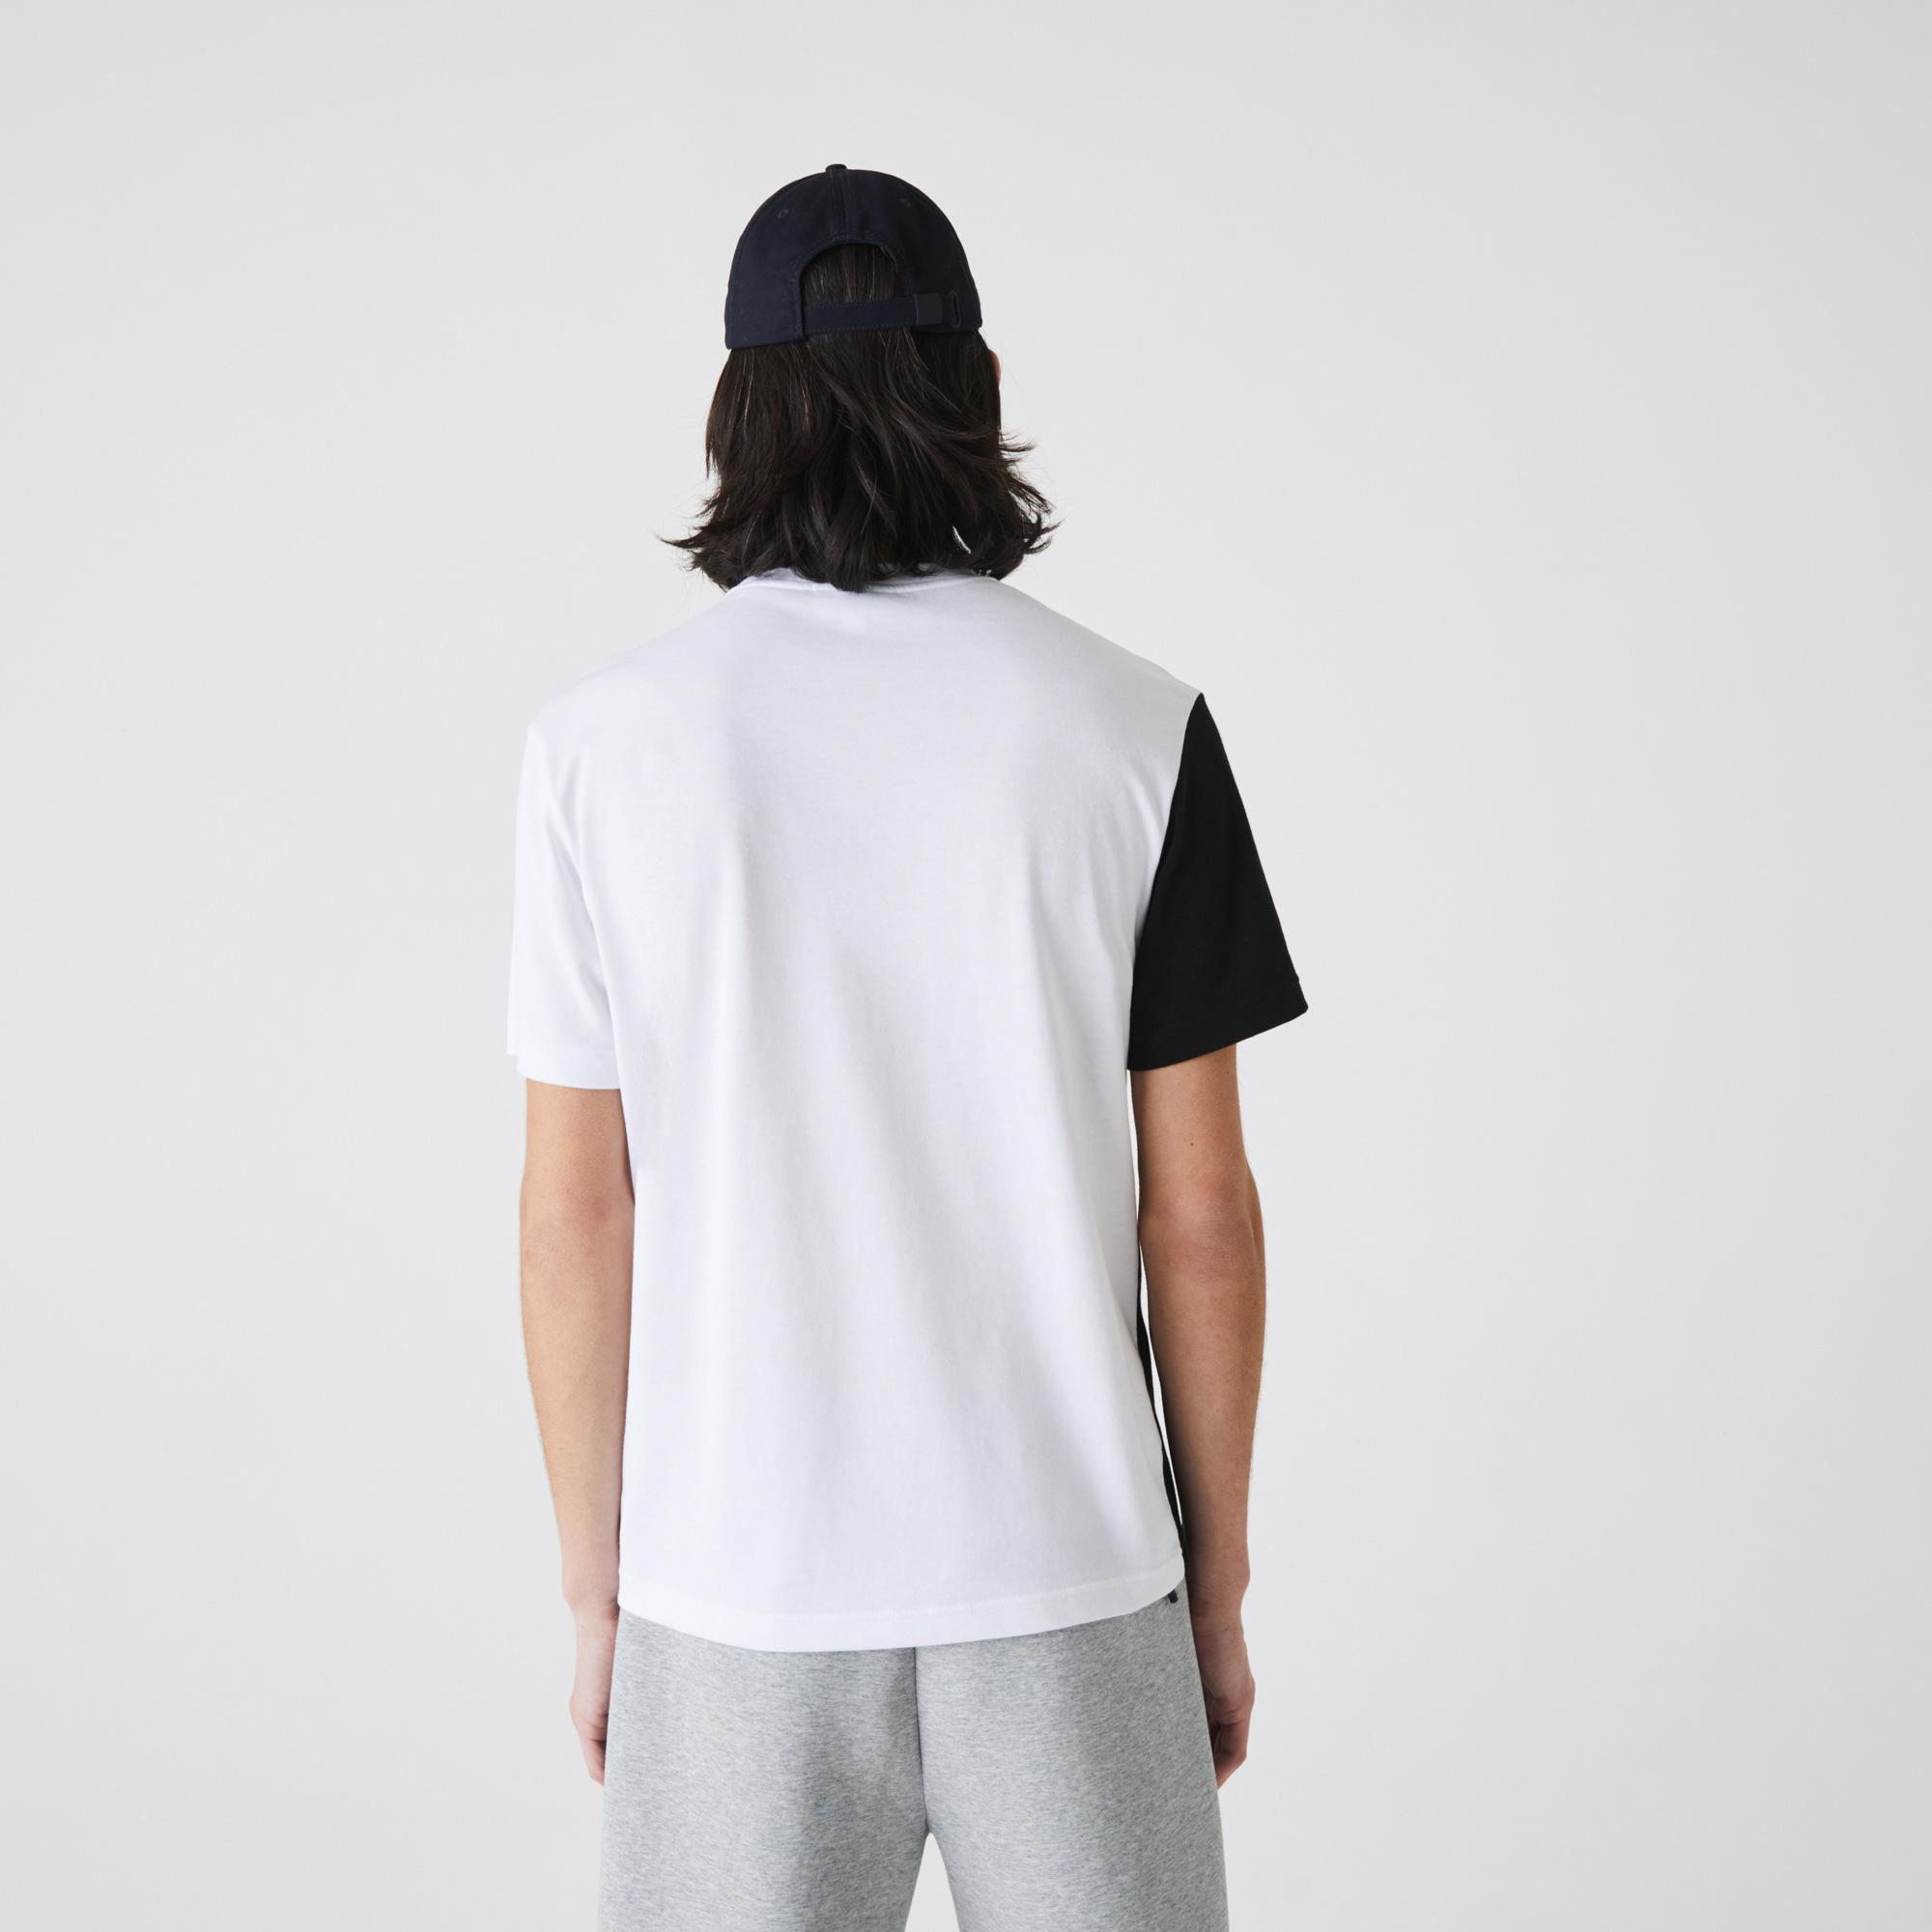 Lacoste Erkek Regular Fit Bisiklet Yaka Baskılı Renk Bloklu Beyaz T-Shirt